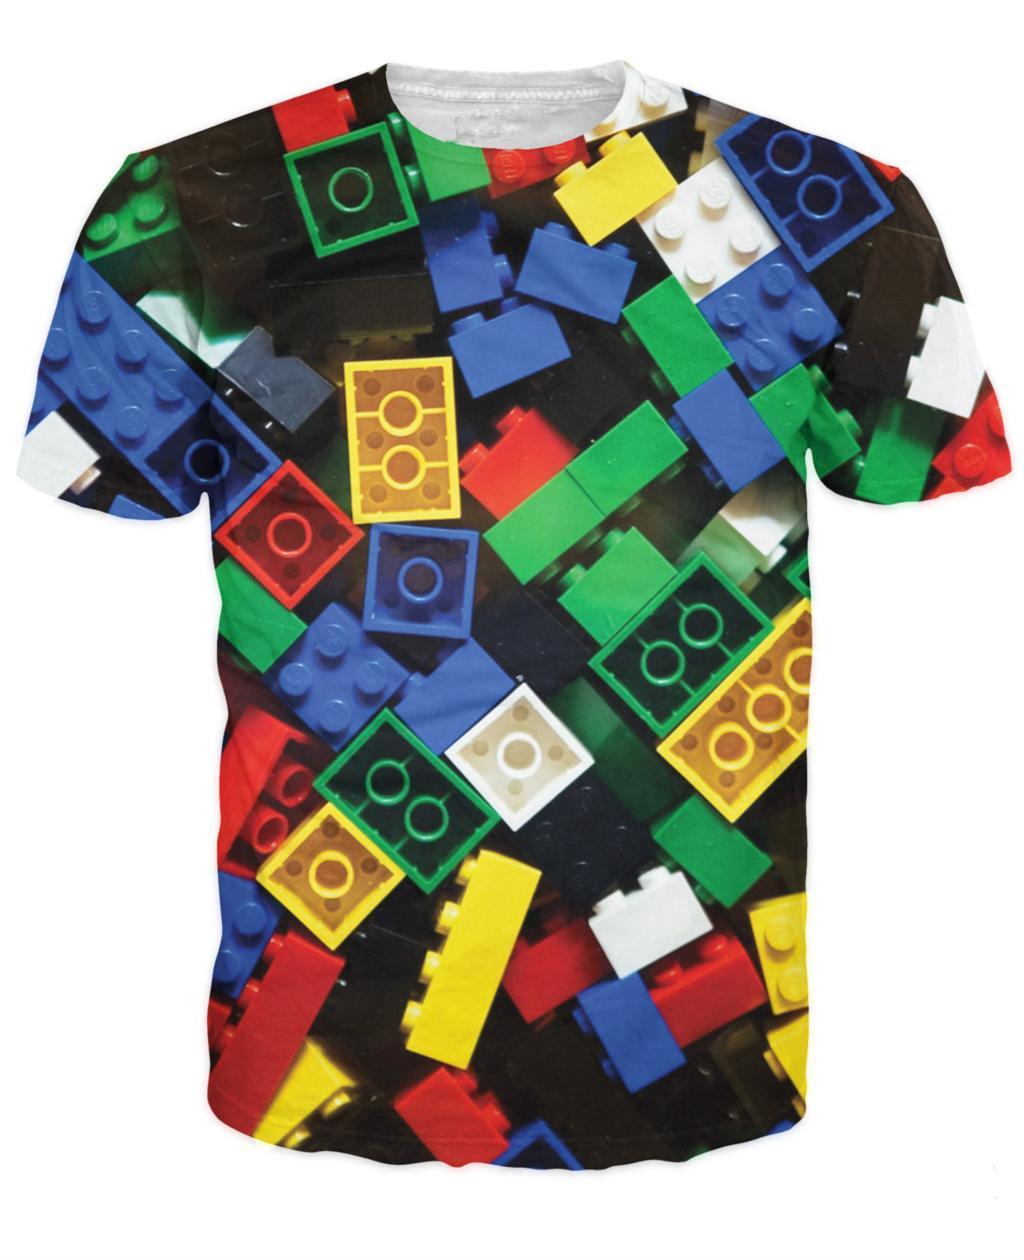 Summer Style Lego Bricks T-Shirt Super Popular Children's Toy 3D Printed T Shirt Camisetas For Unisex Women Men Plus Size S-XXL(China (Mainland))